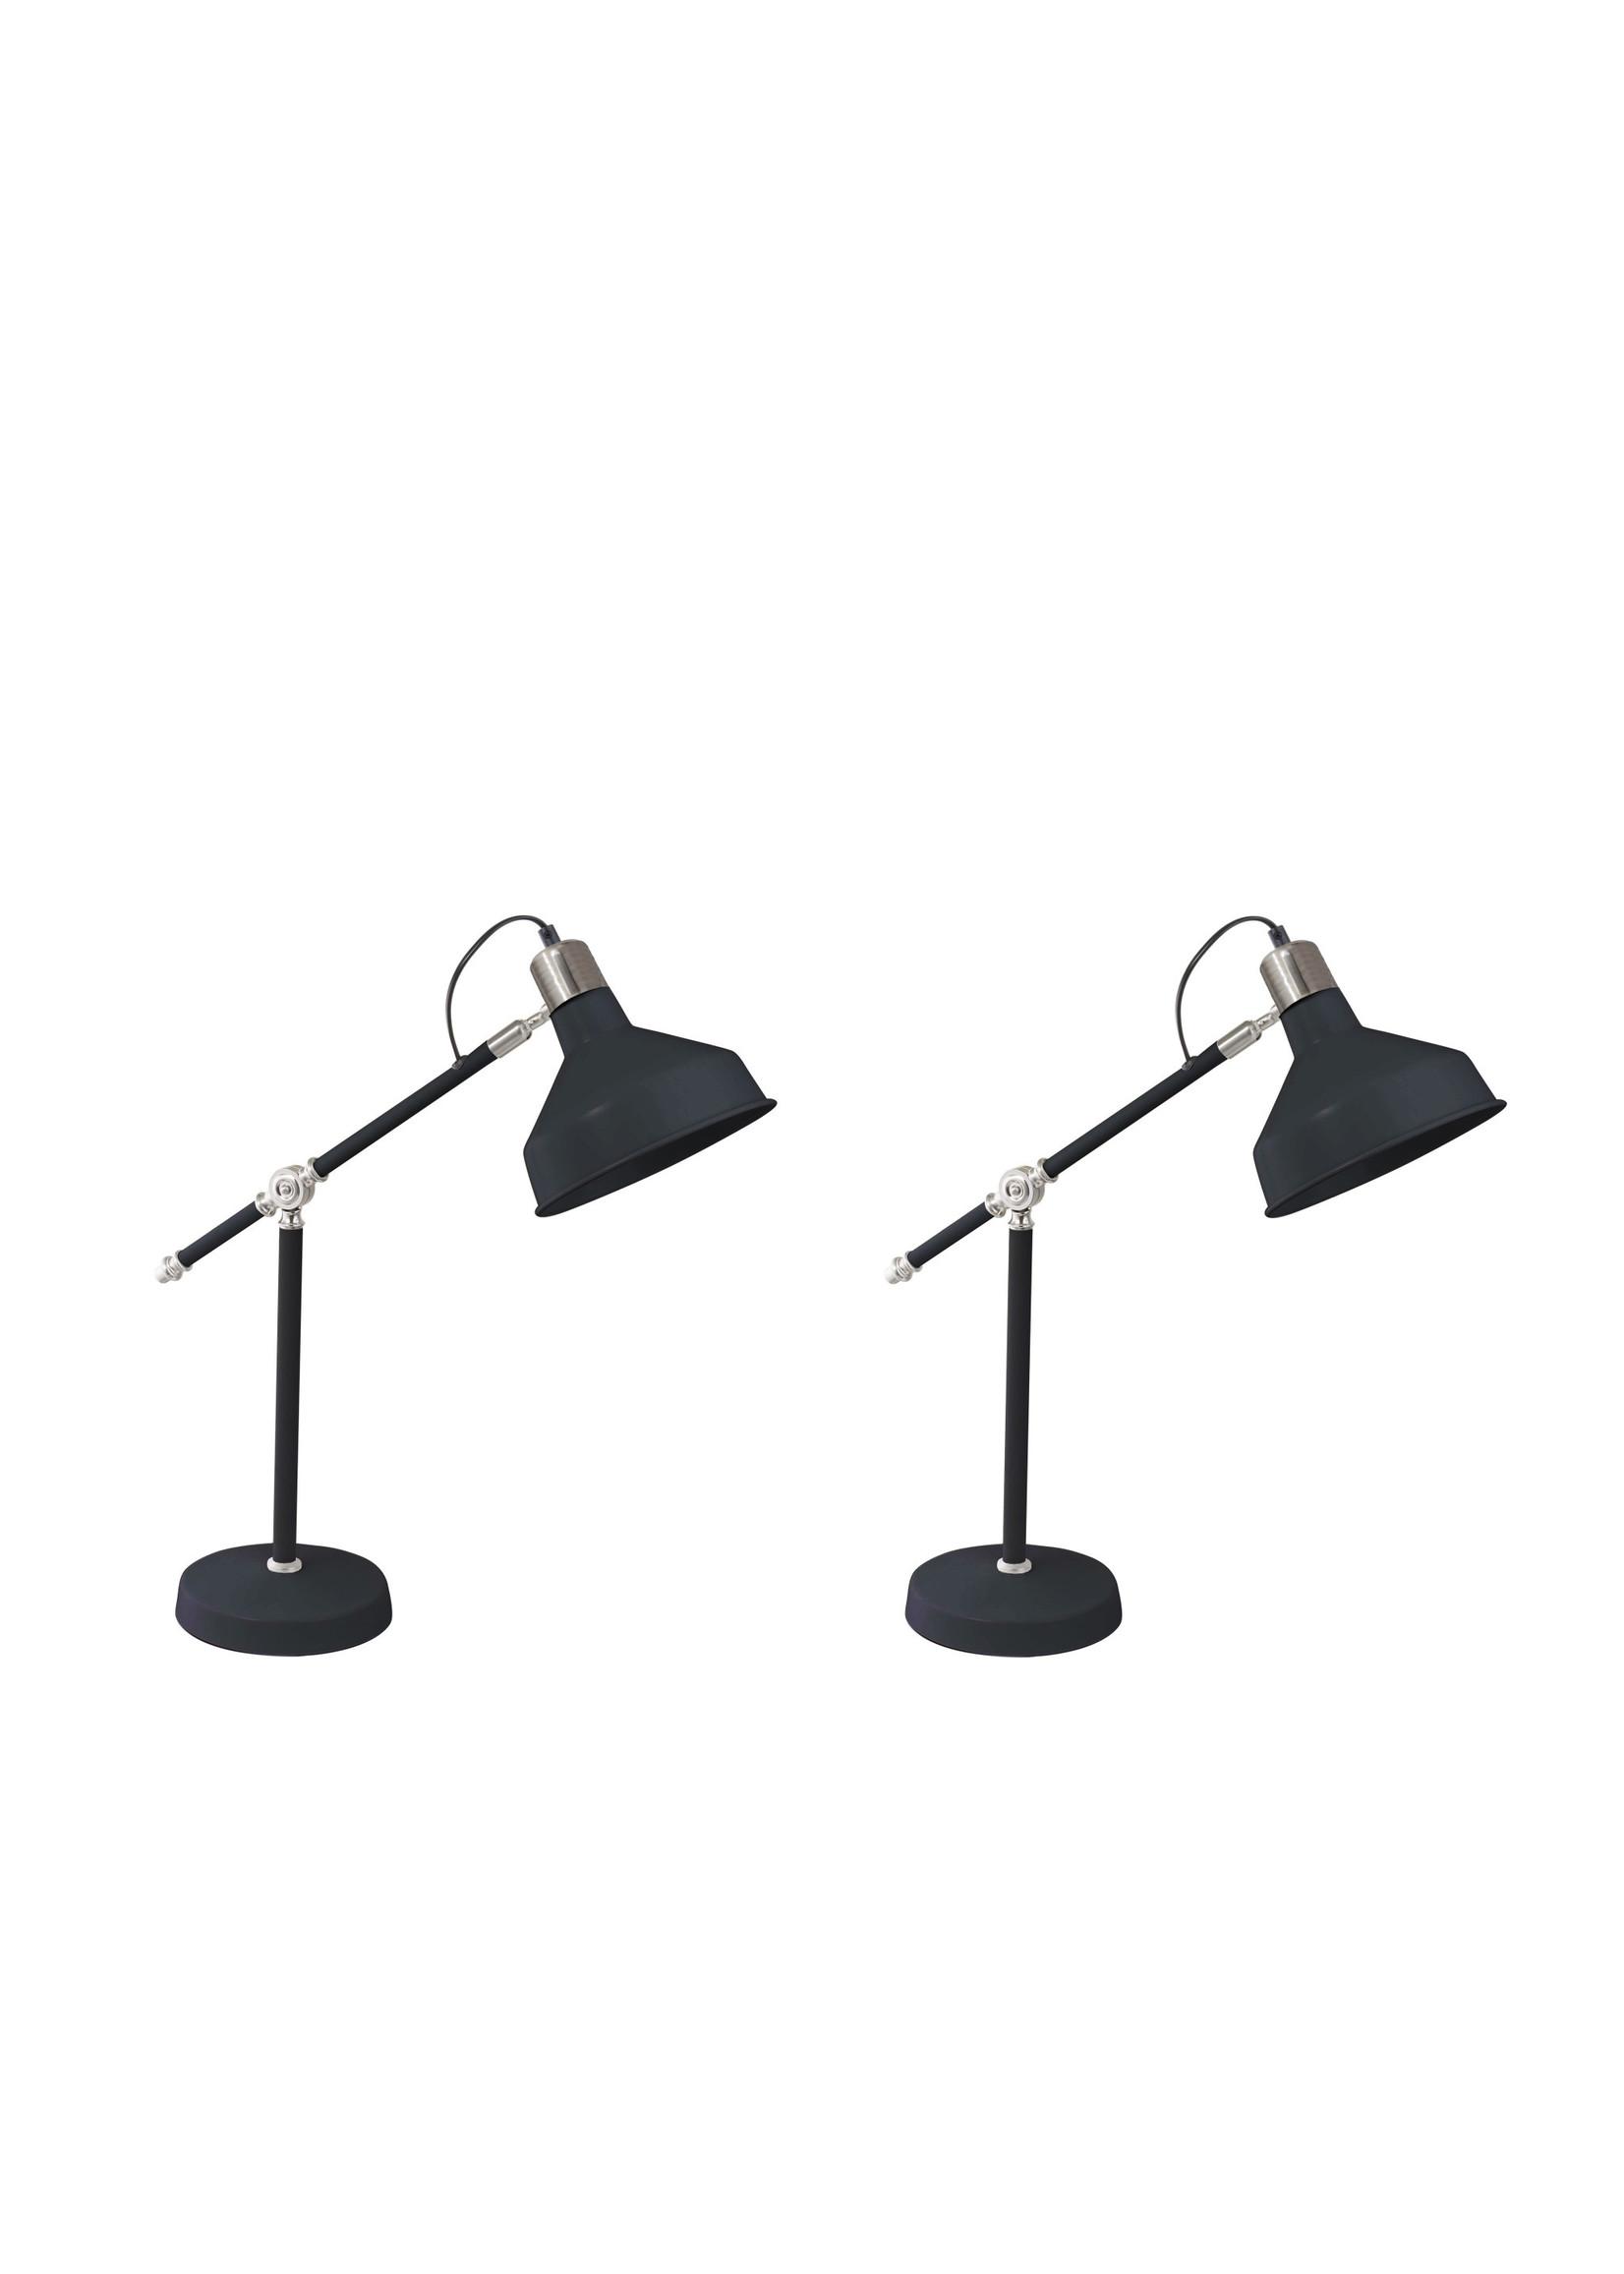 "Sagebrook Home Metal 20"" Dome Shade Task Lamp Black"